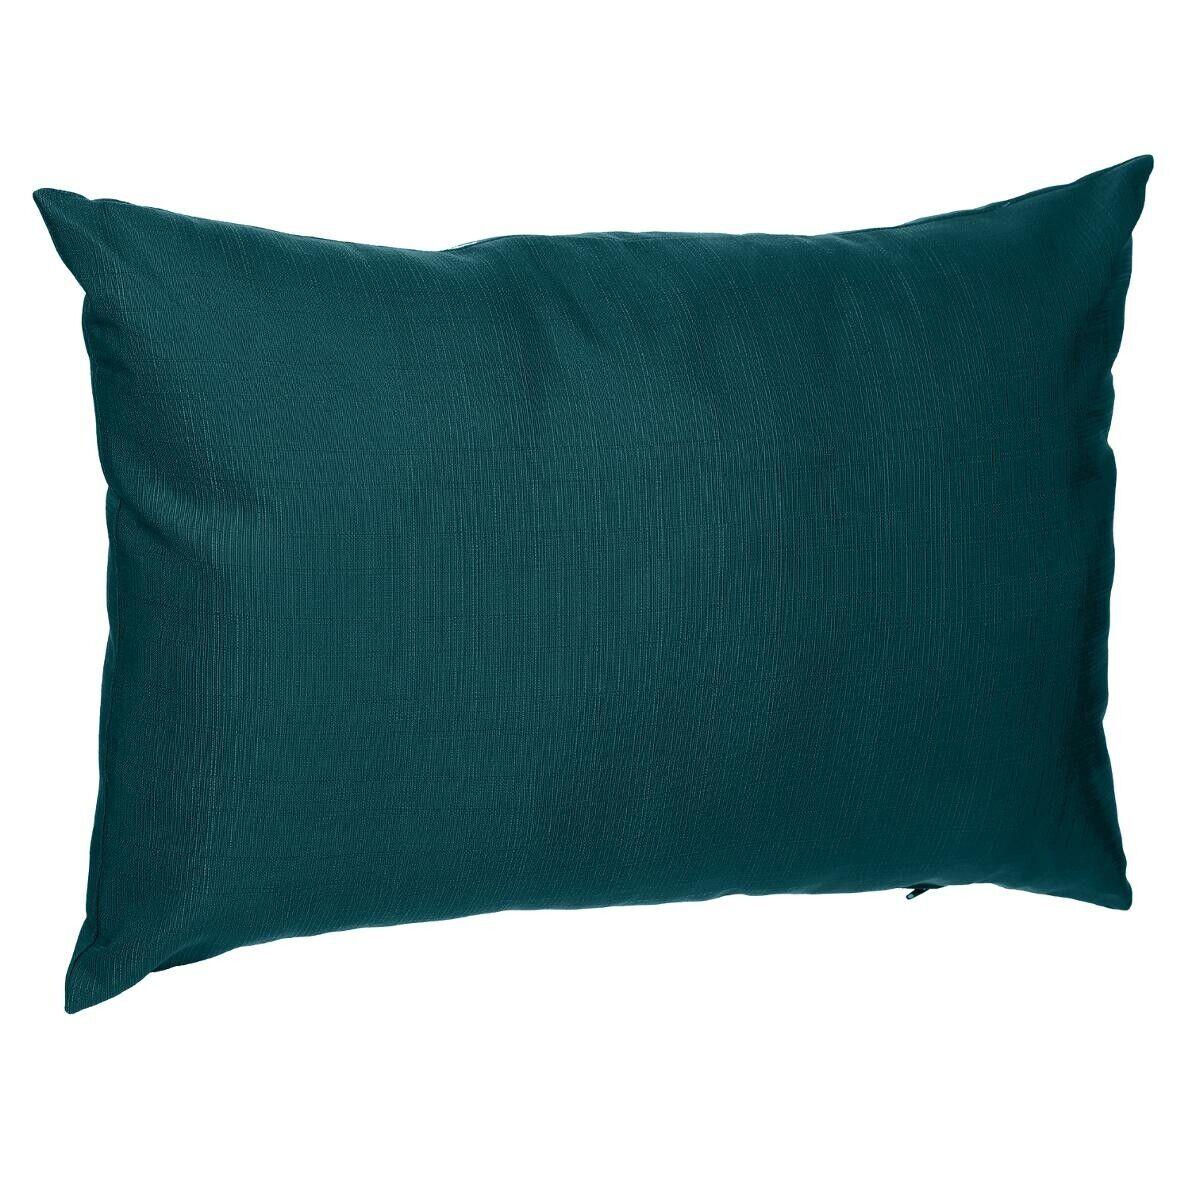 Hespéride Coussin déco d'extérieur Korai Bleu canard Jardin 30 x 50 cm - Polyester